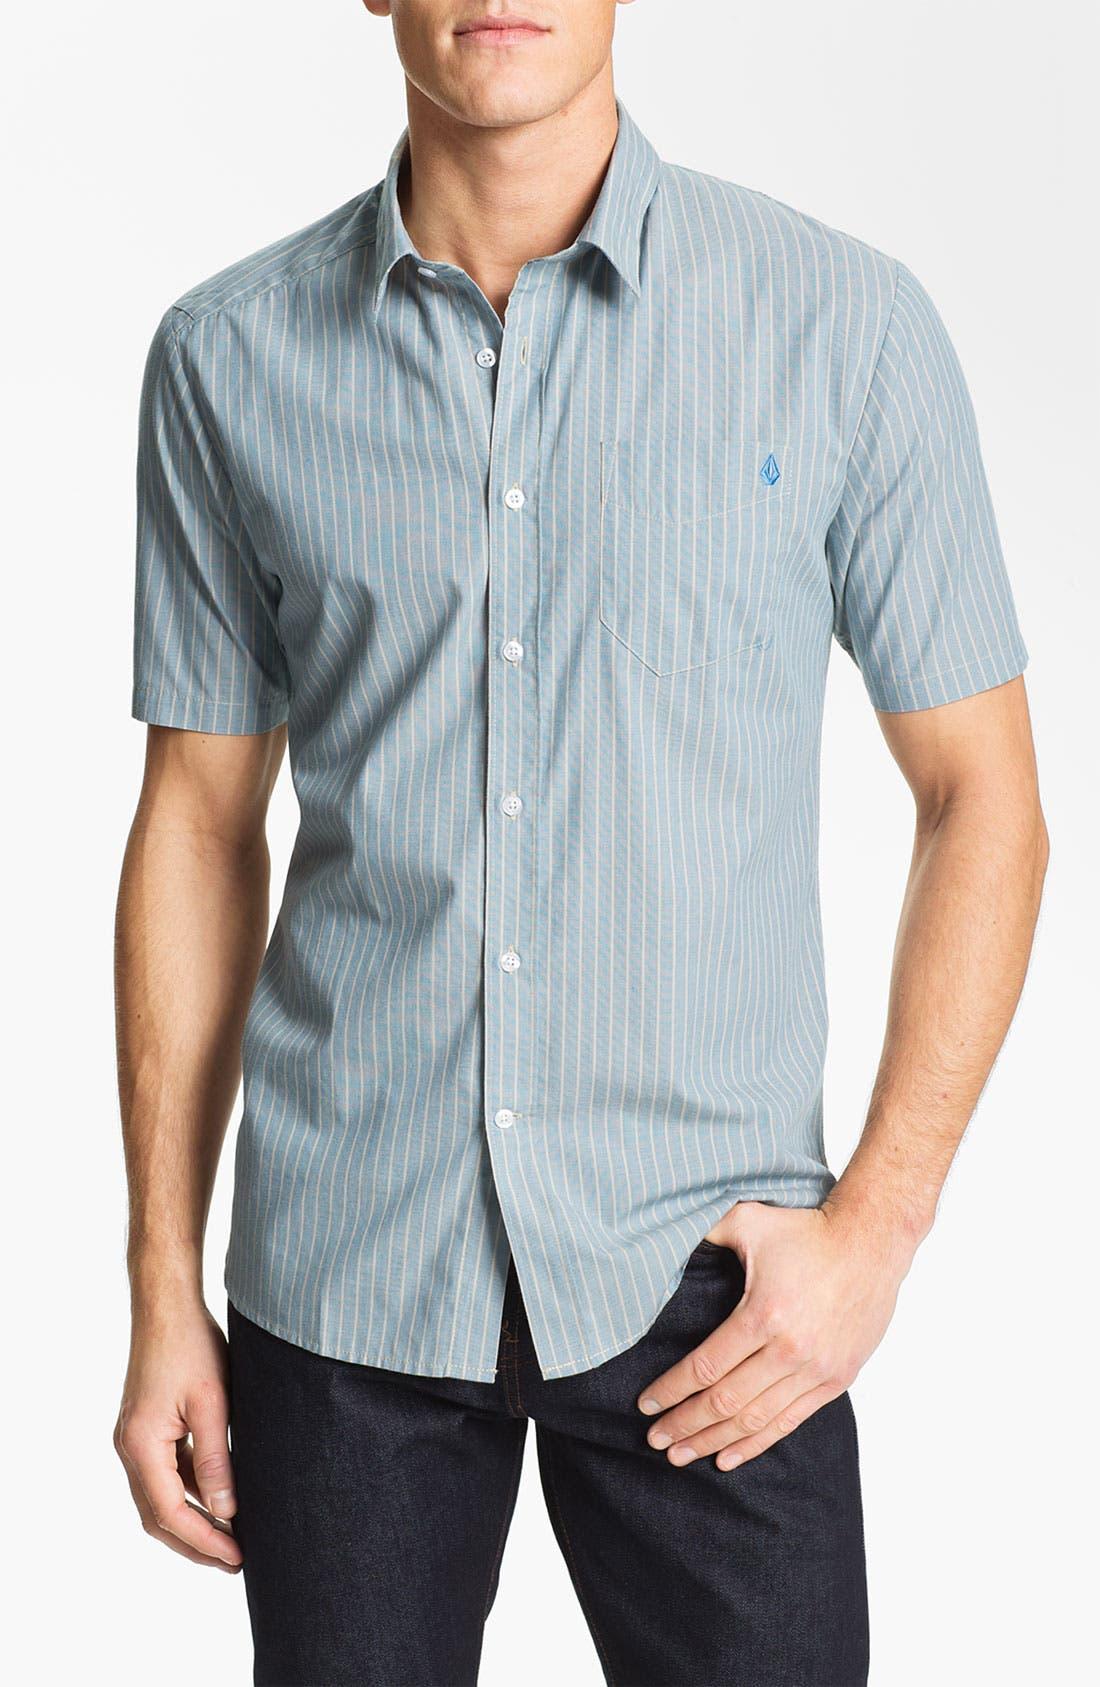 Alternate Image 1 Selected - Volcom 'Why Factor' Stripe Woven Shirt